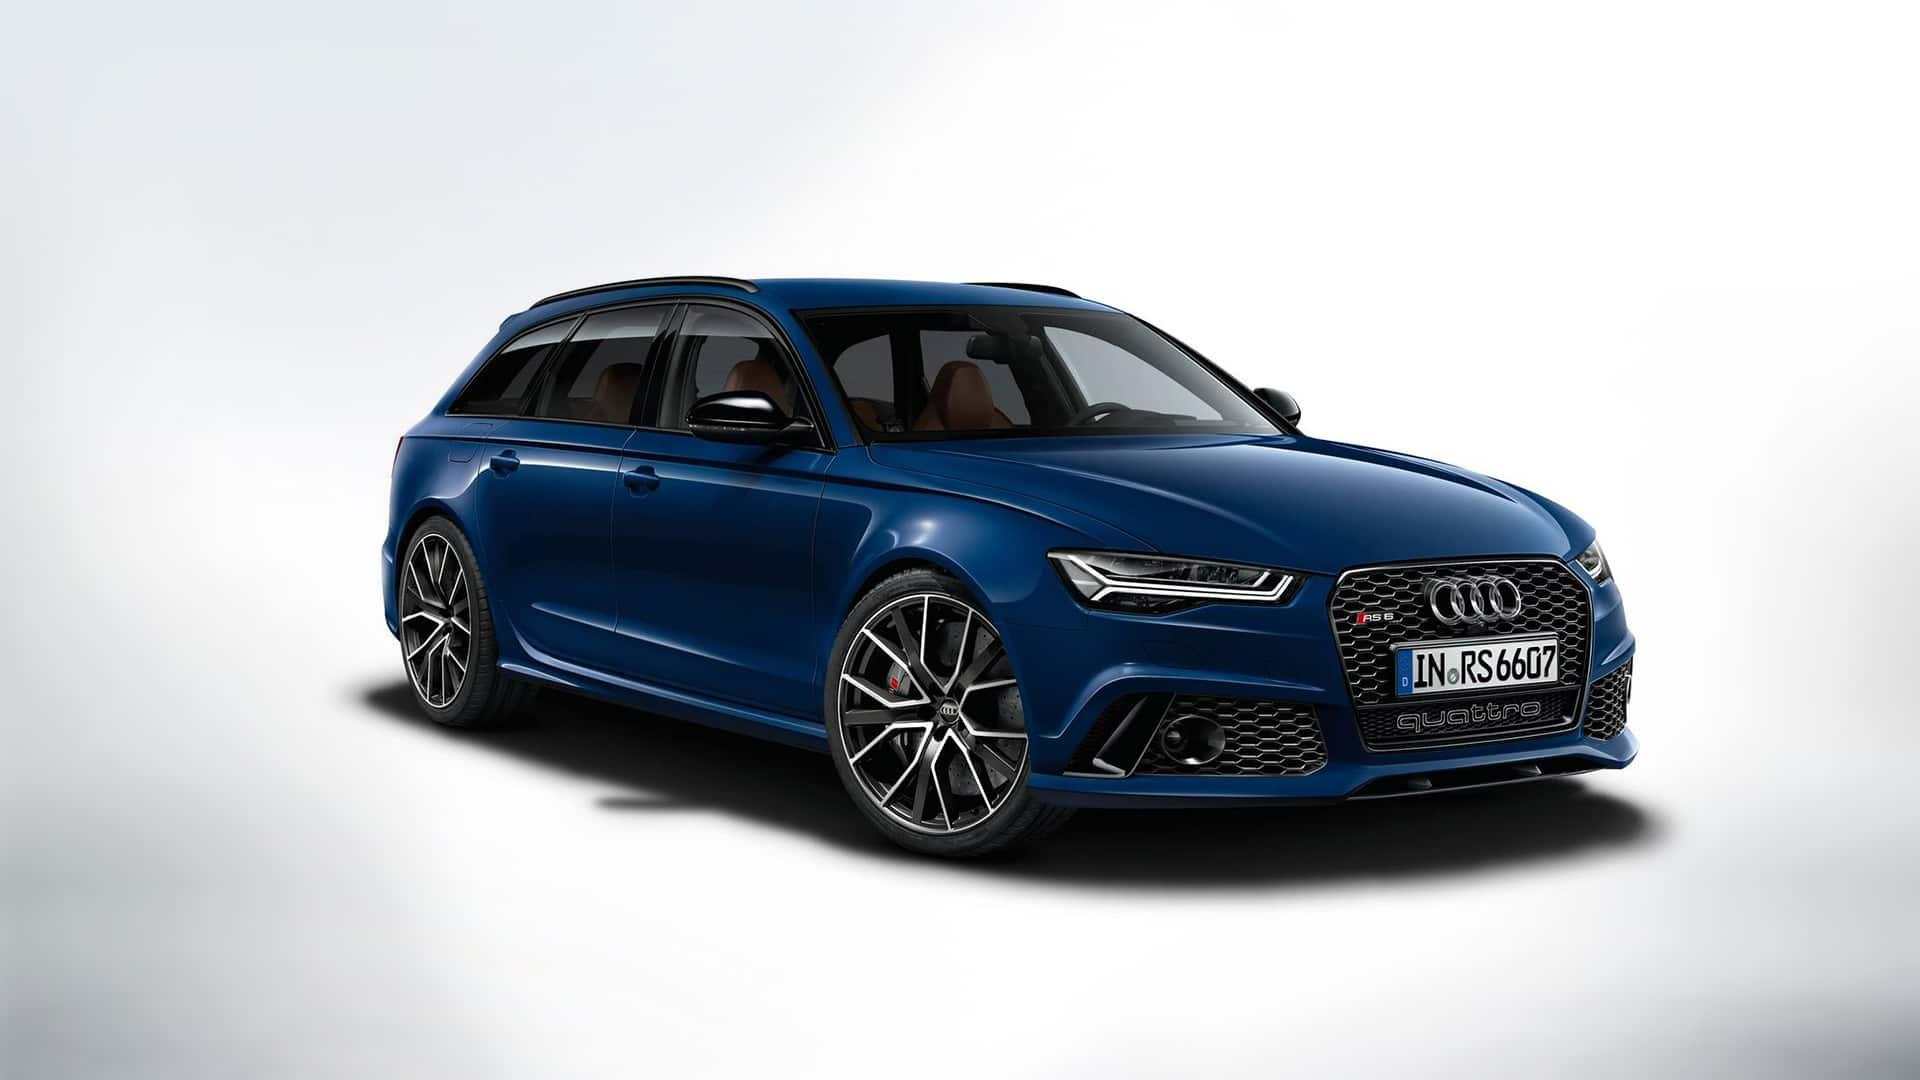 Kekurangan Audi Rs6 Avant Performance Tangguh